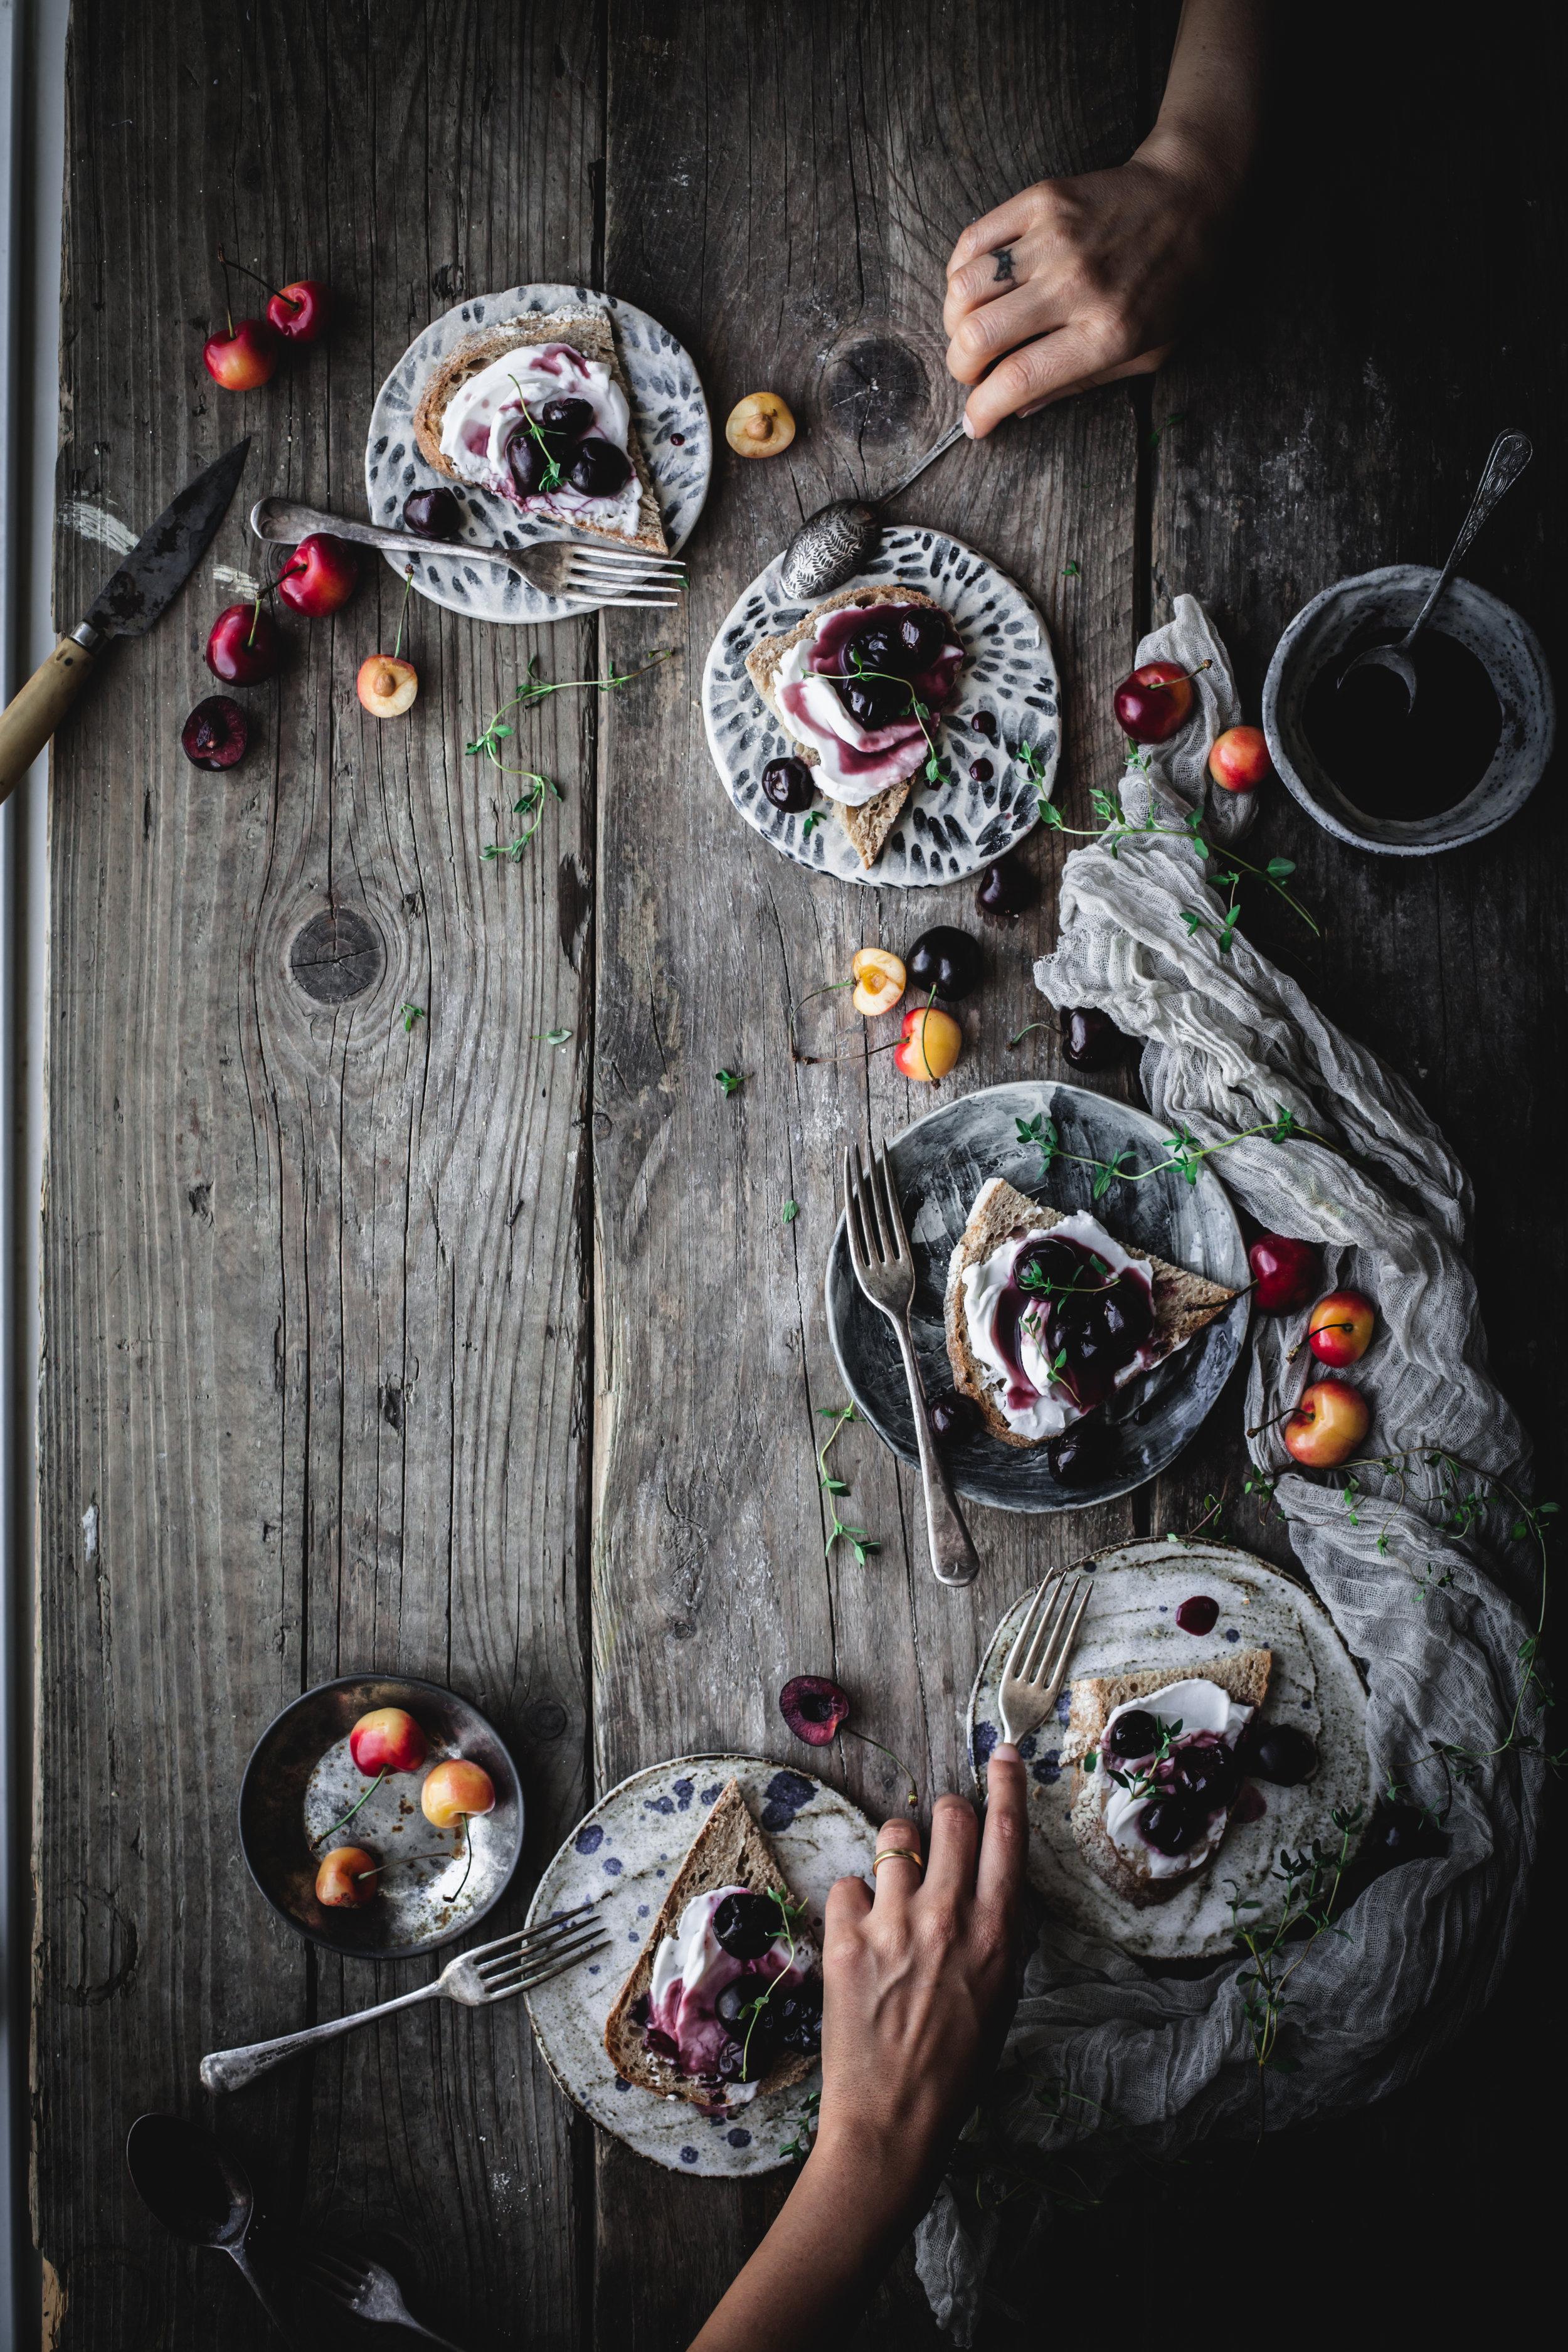 cherries and vegan cream cheese open sandwiches for breakfast